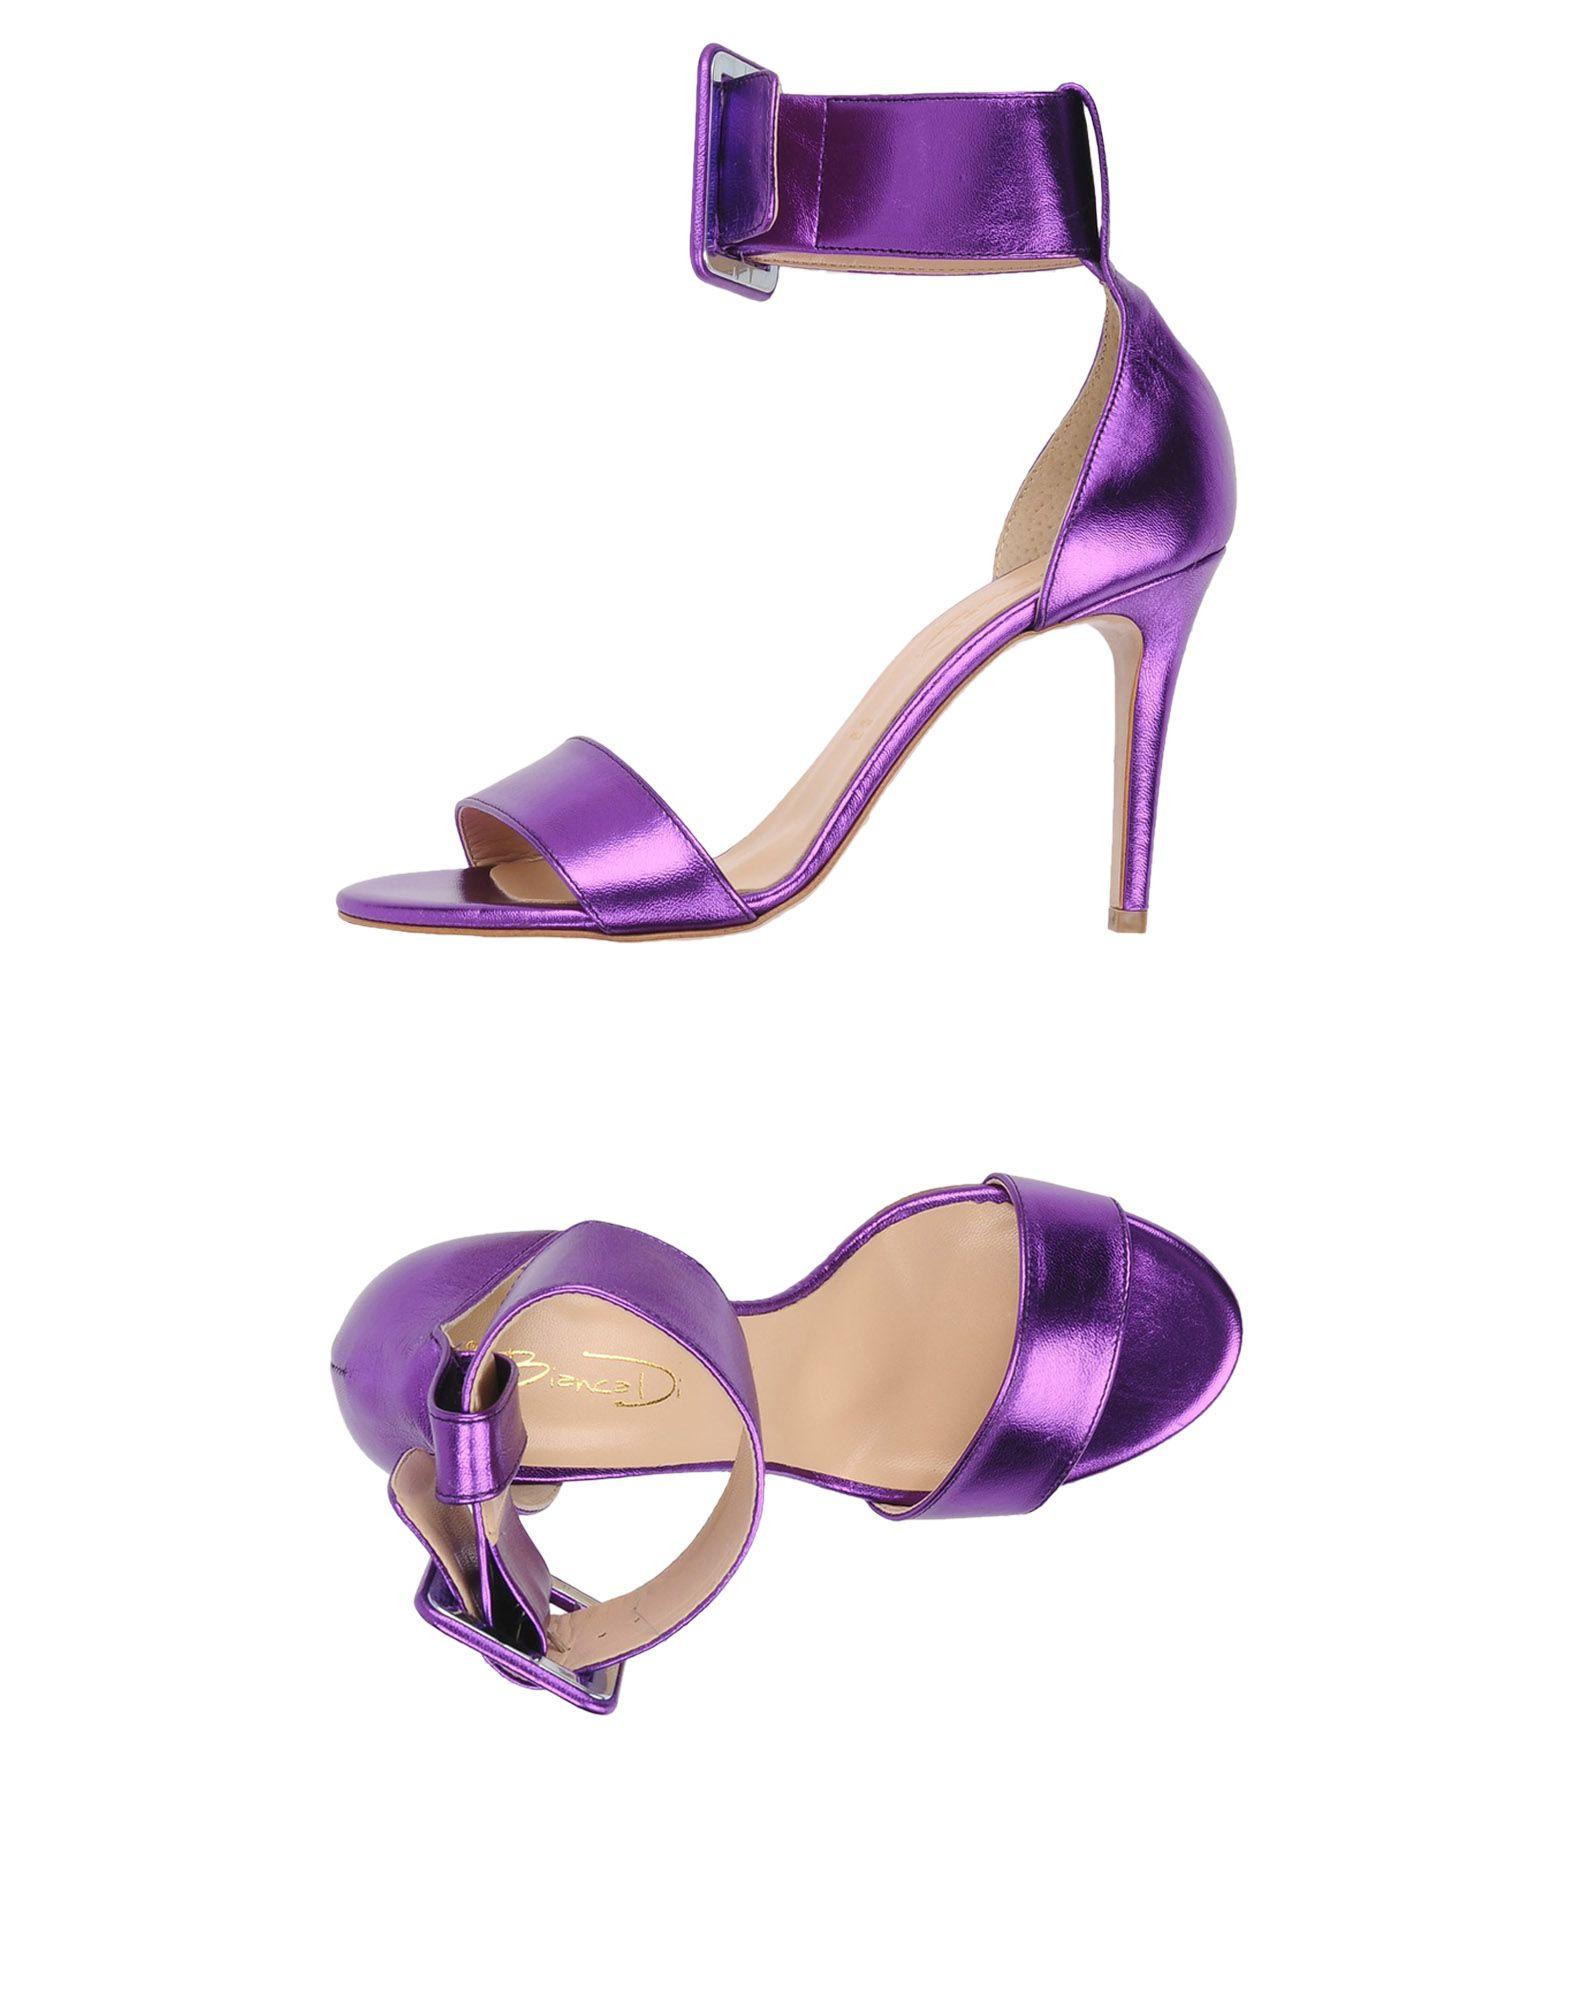 Bianca Di Sandalen Damen  11440866ES Gute Qualität beliebte Schuhe